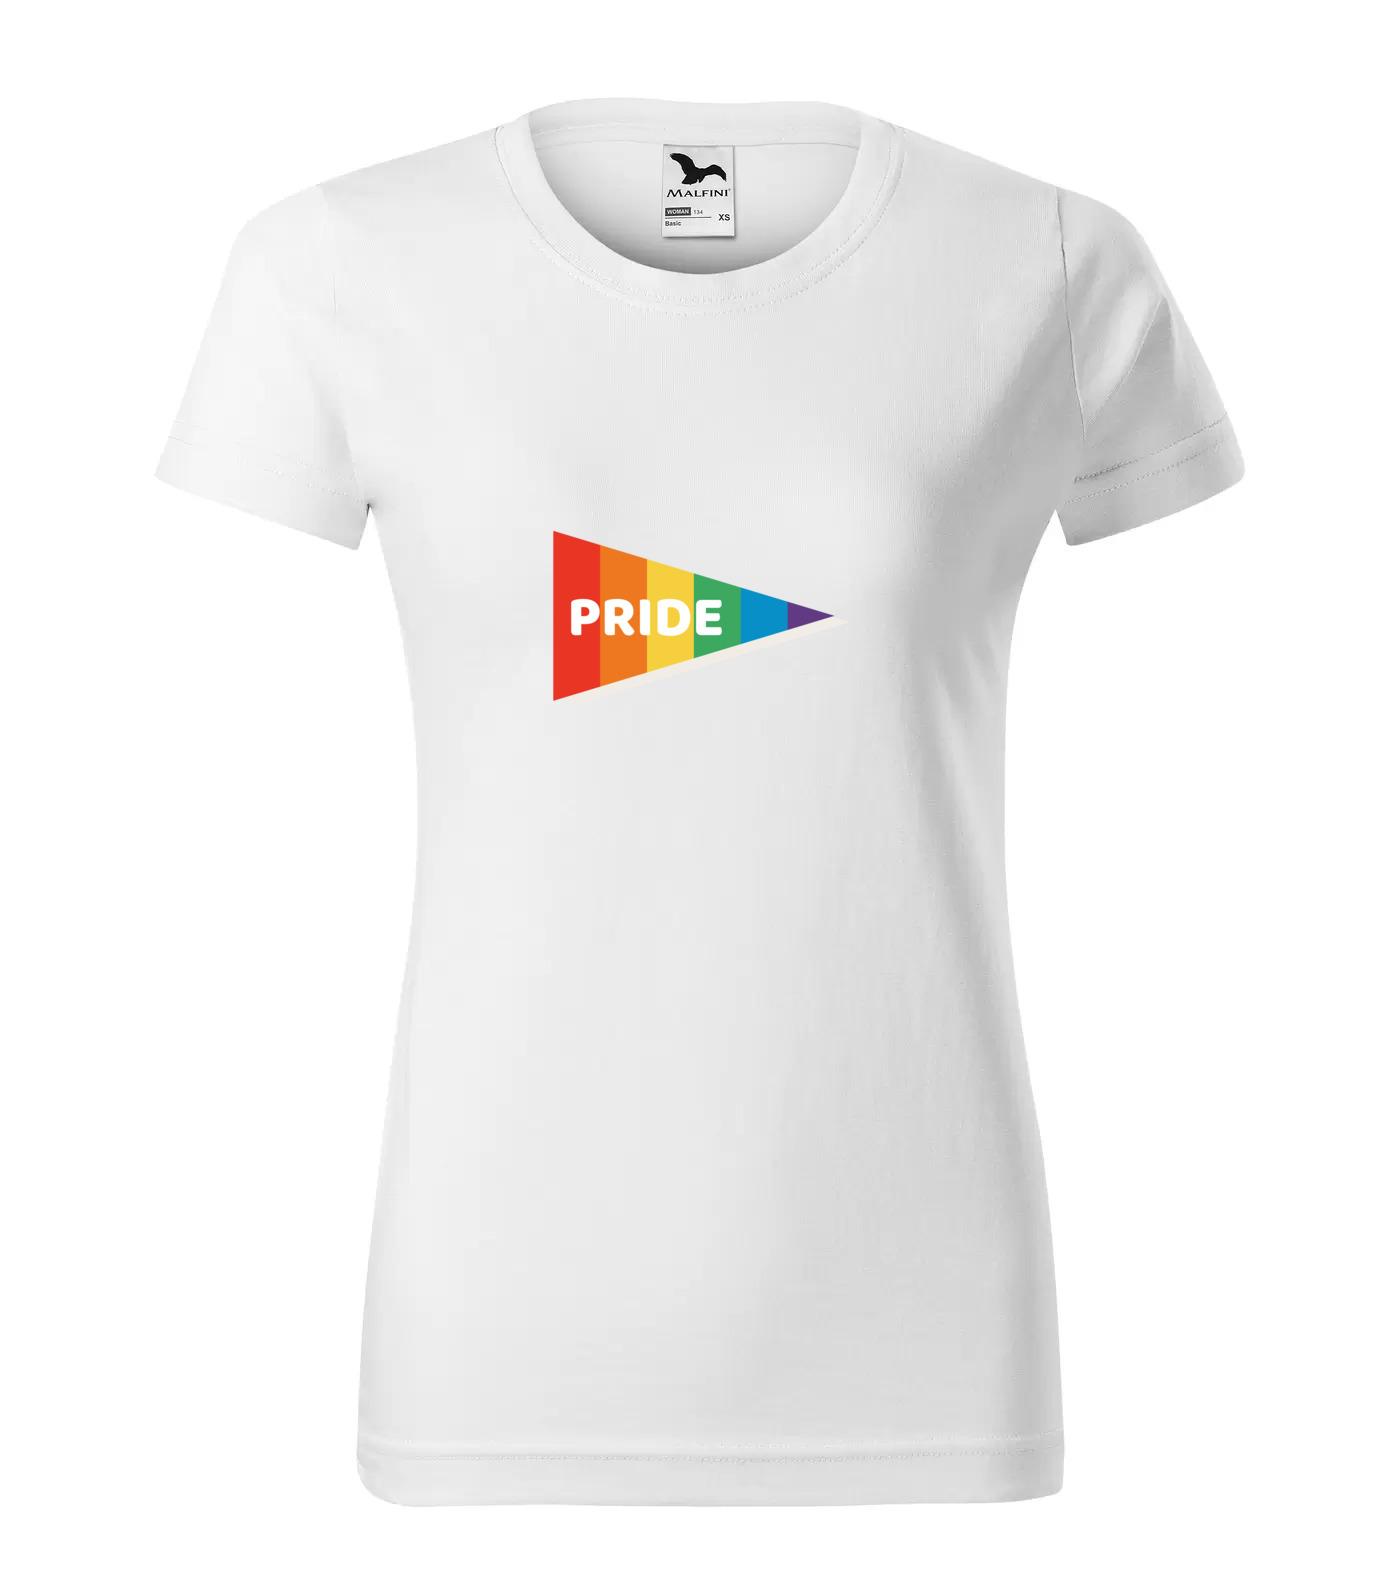 Tričko LGBT PrideVlajka